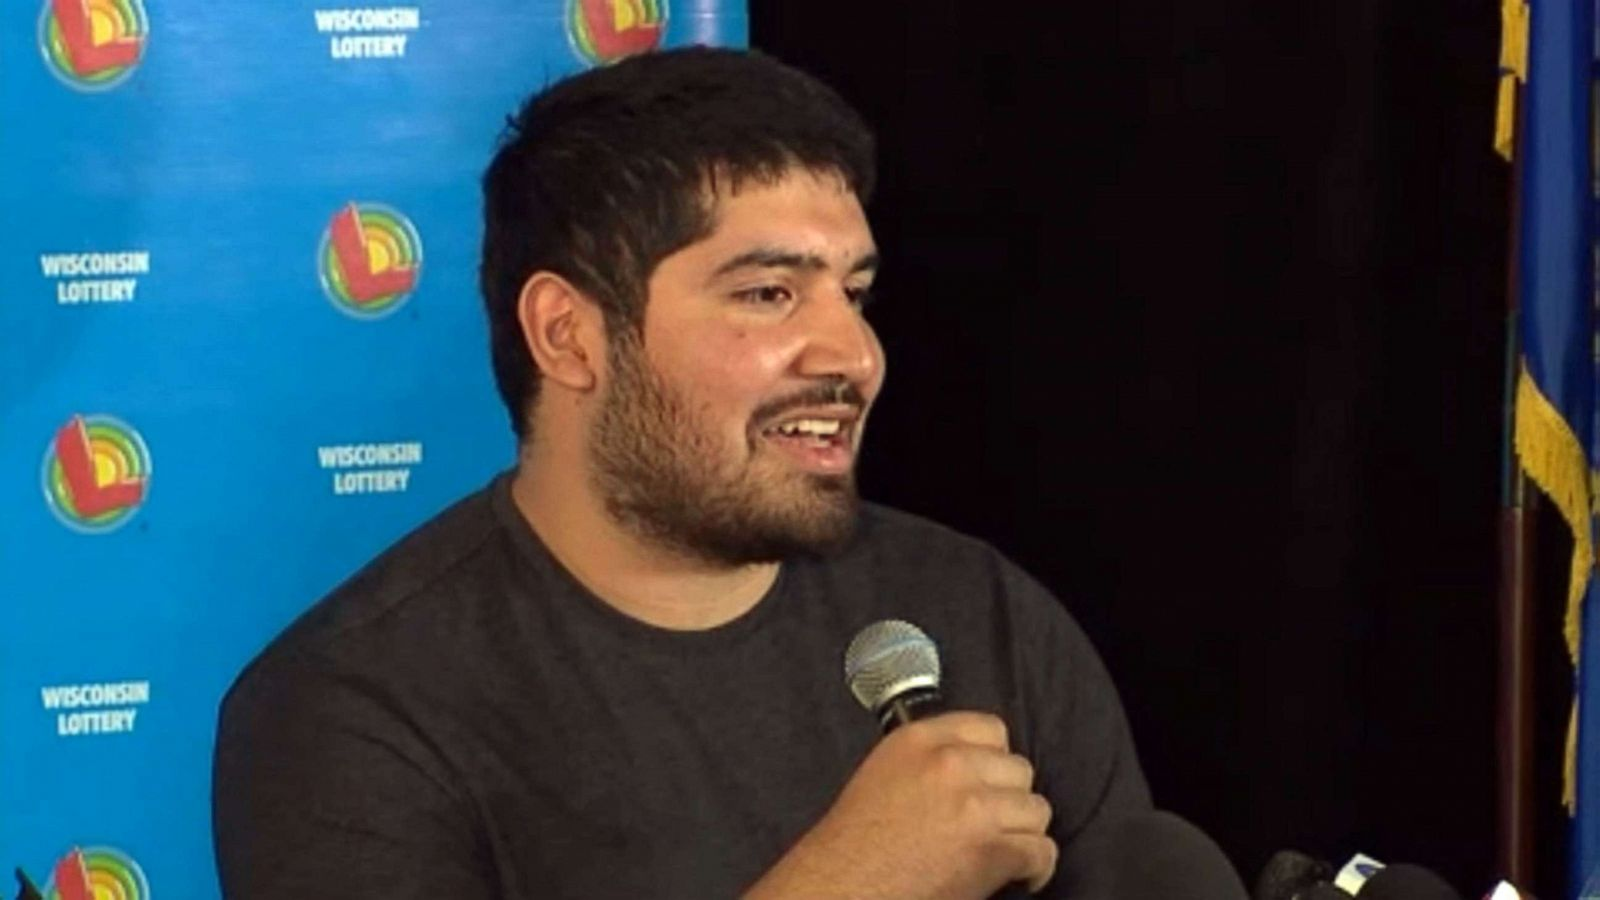 24-year-old Wisconsin man Manuel Franco is winner of $768